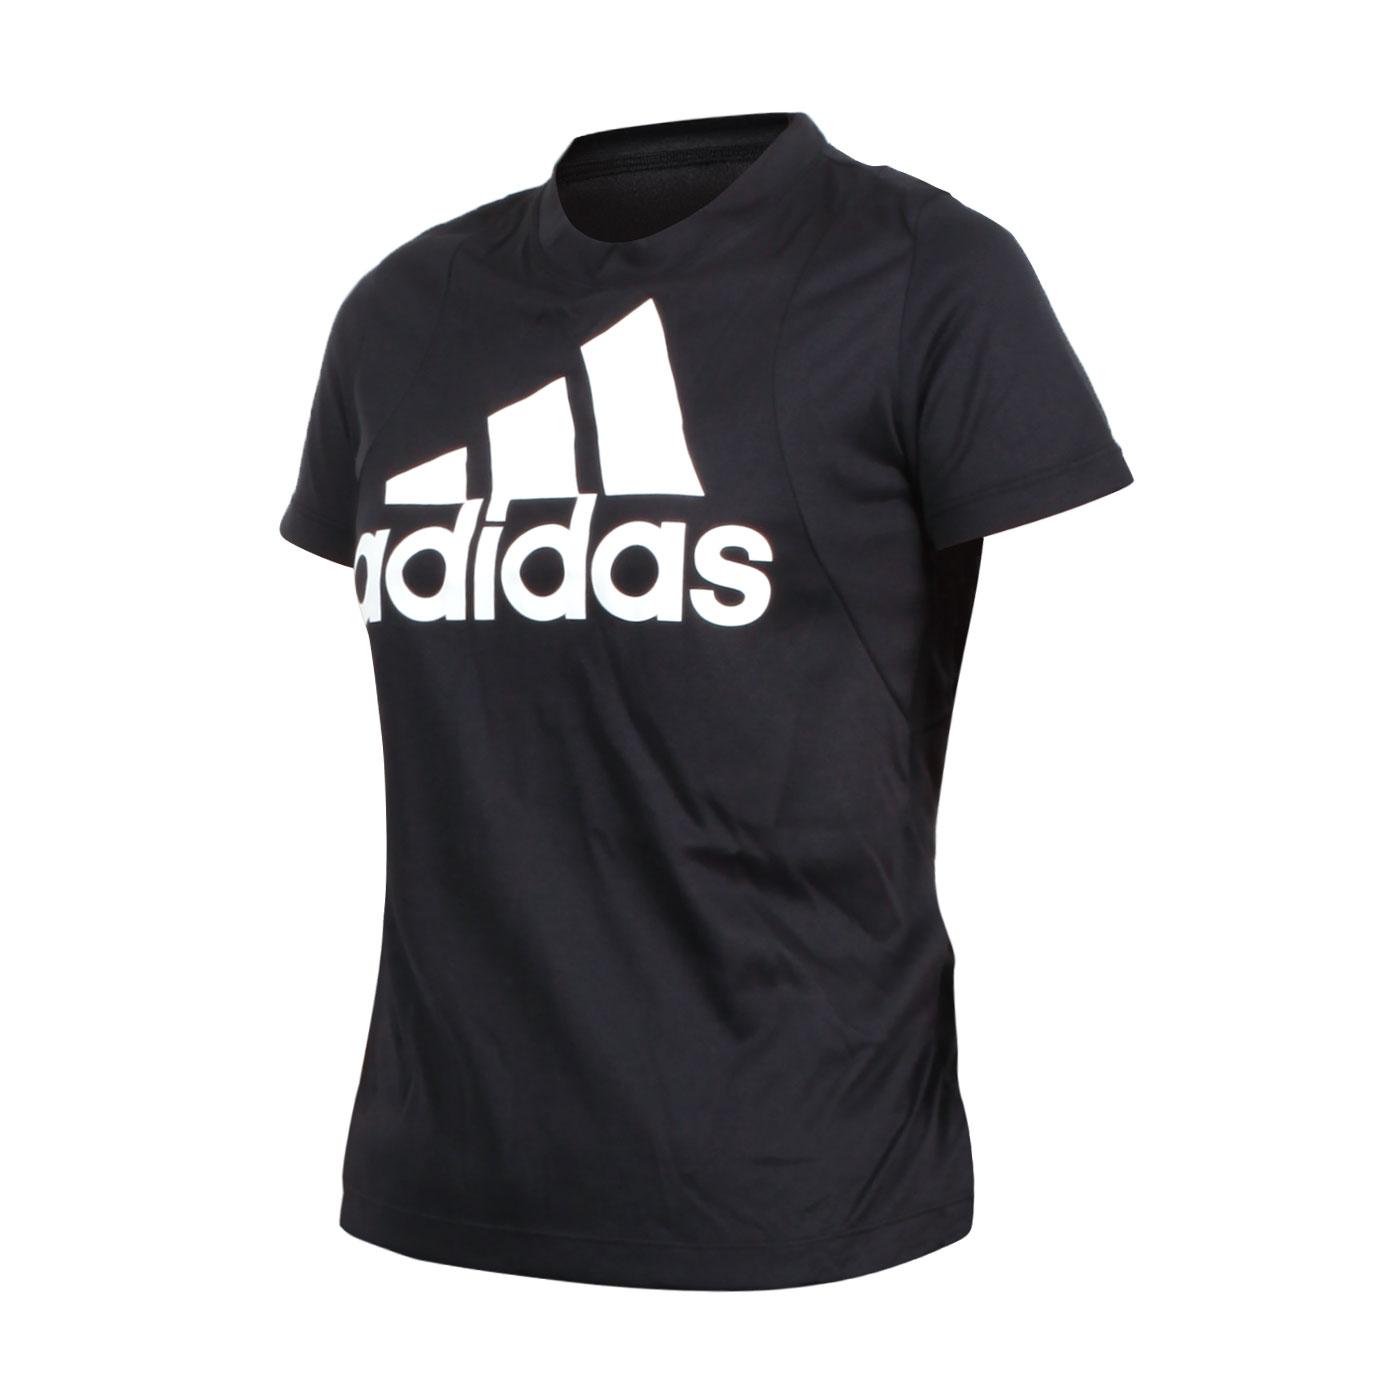 ADIDAS 女款短袖圓領T恤 FT3078 - 黑白